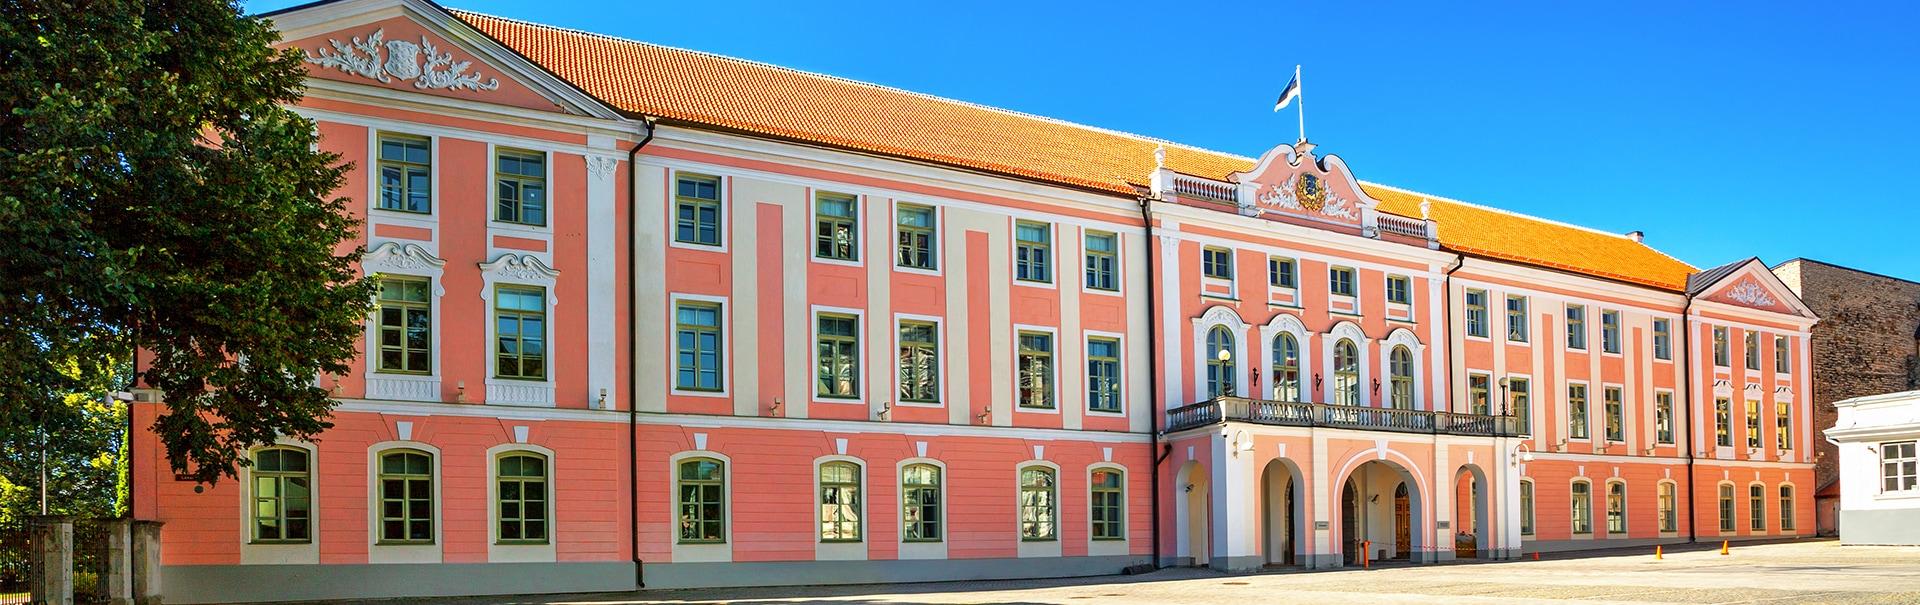 Estonia Latvia Lithuania (EUCB) Banner